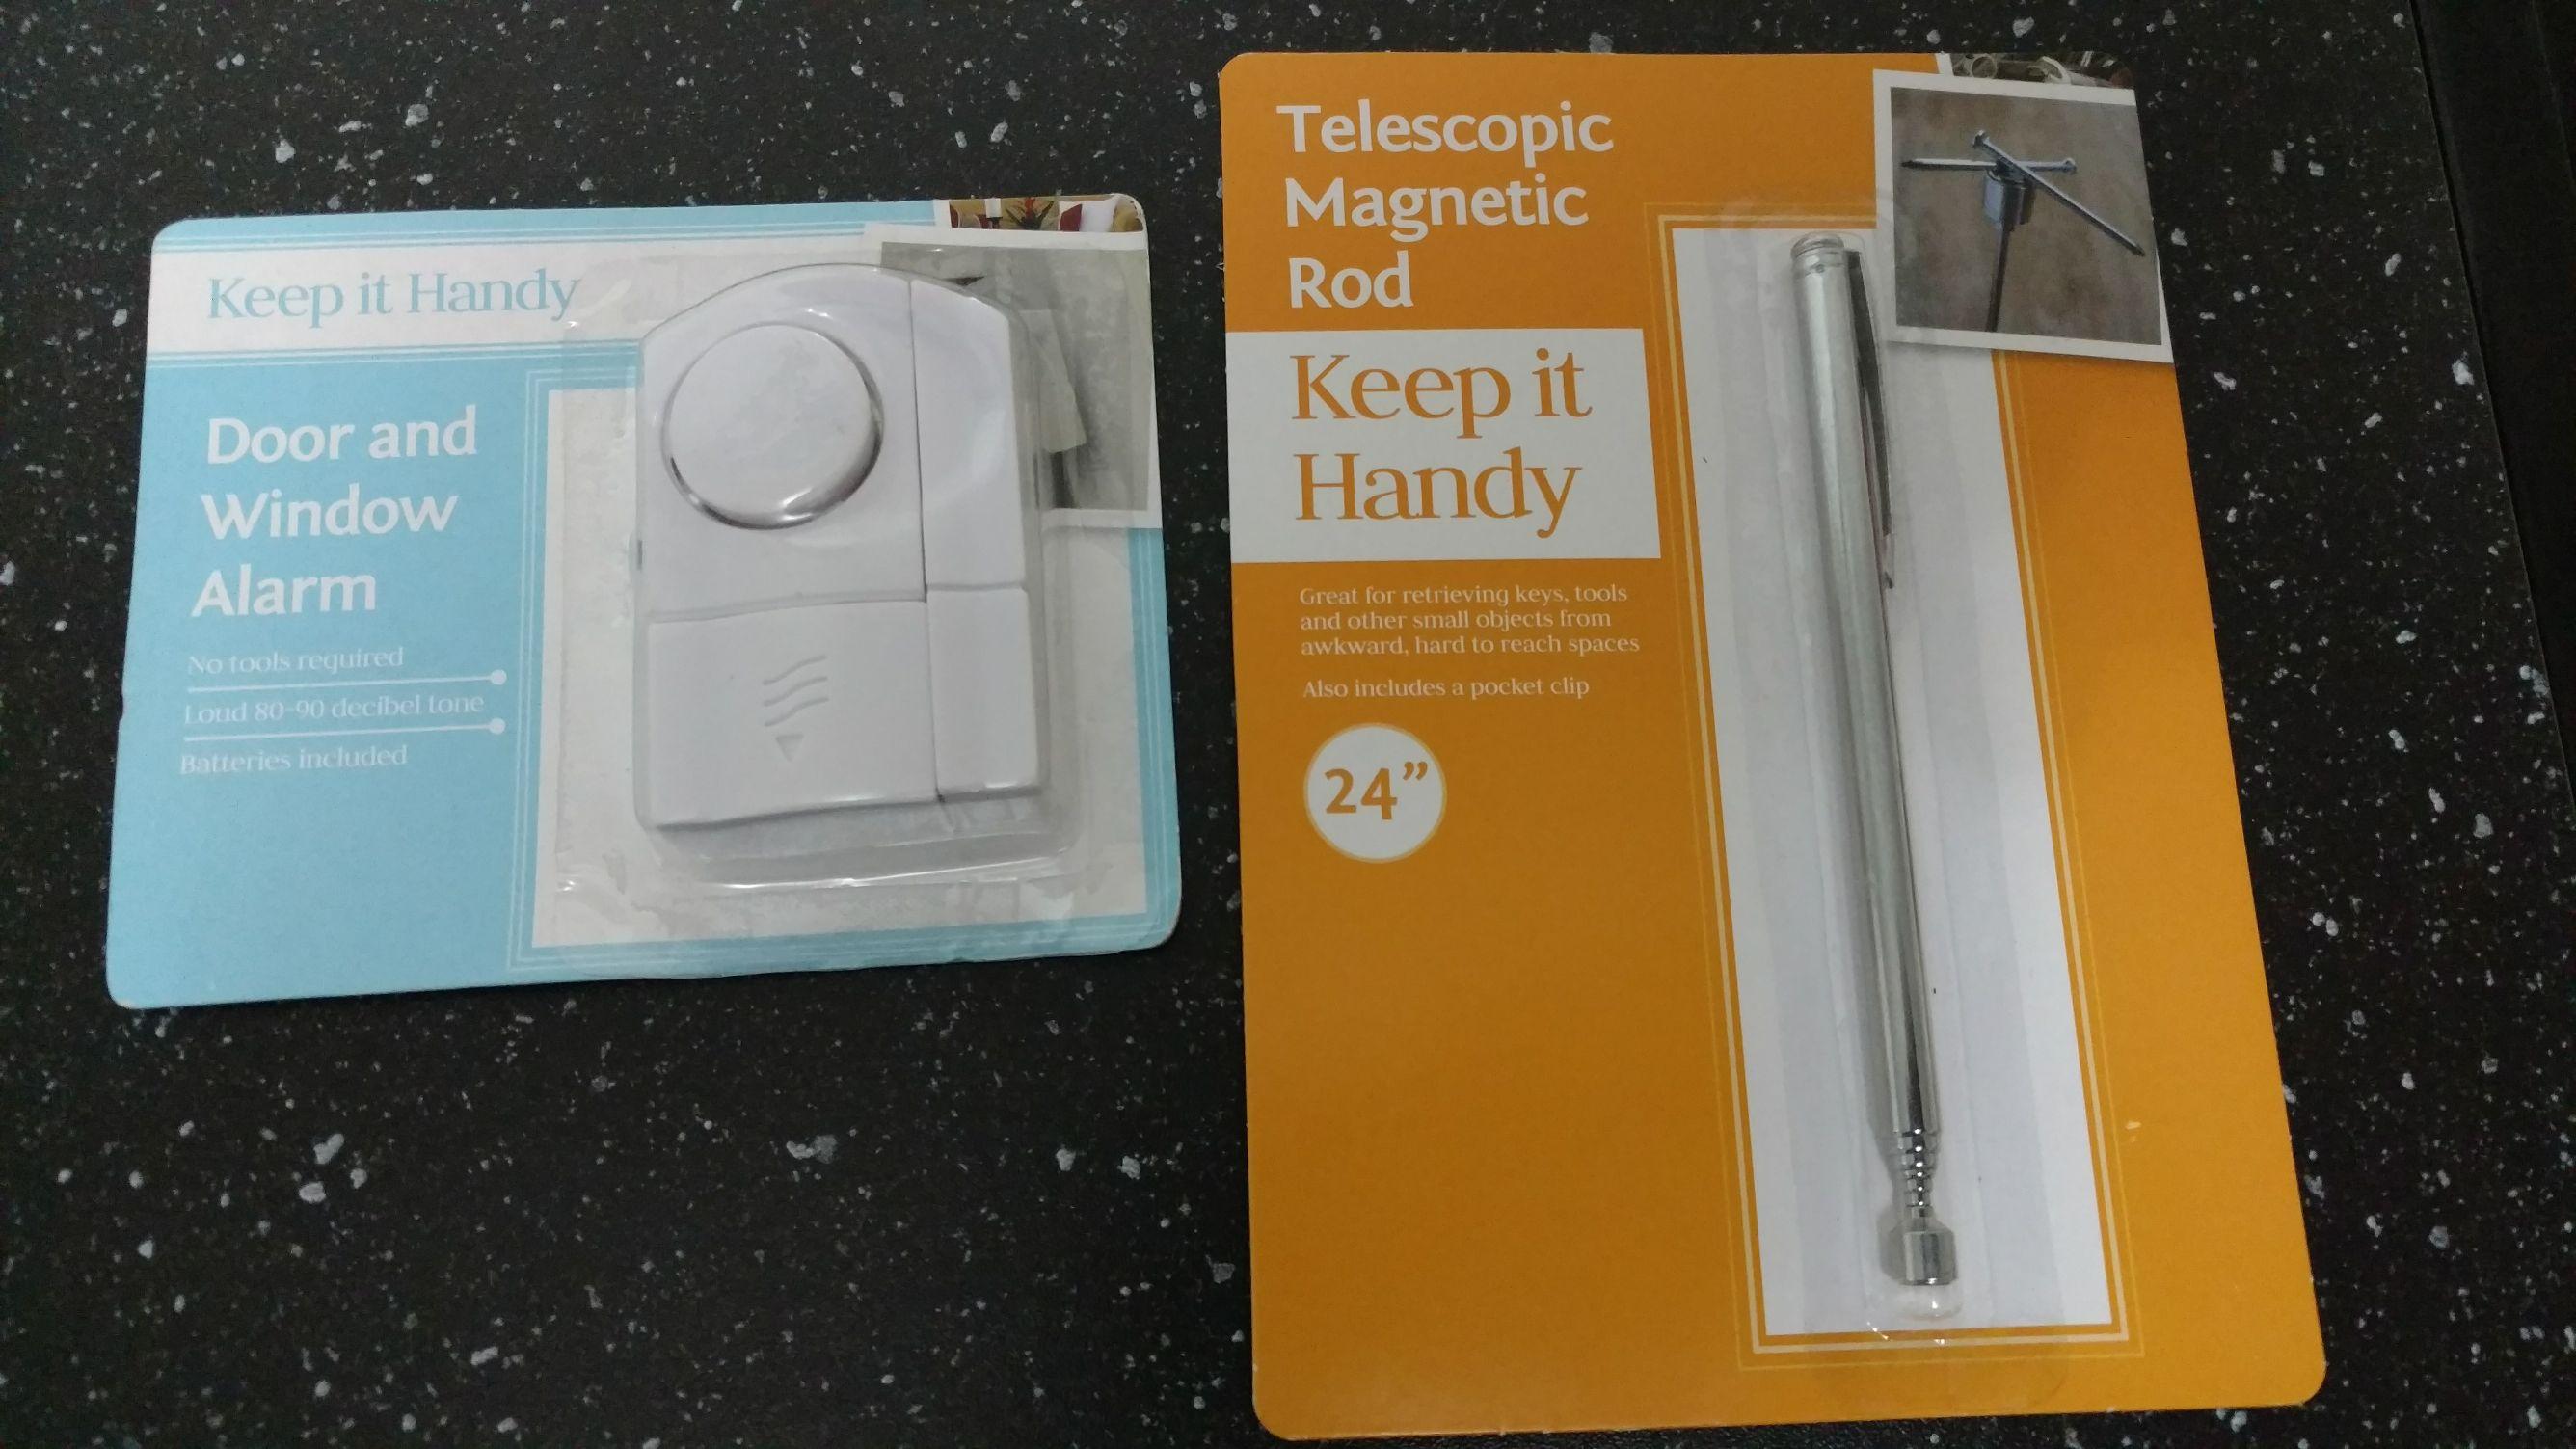 door and window alarm and telescopic magnetic rod 25p each @ tesco